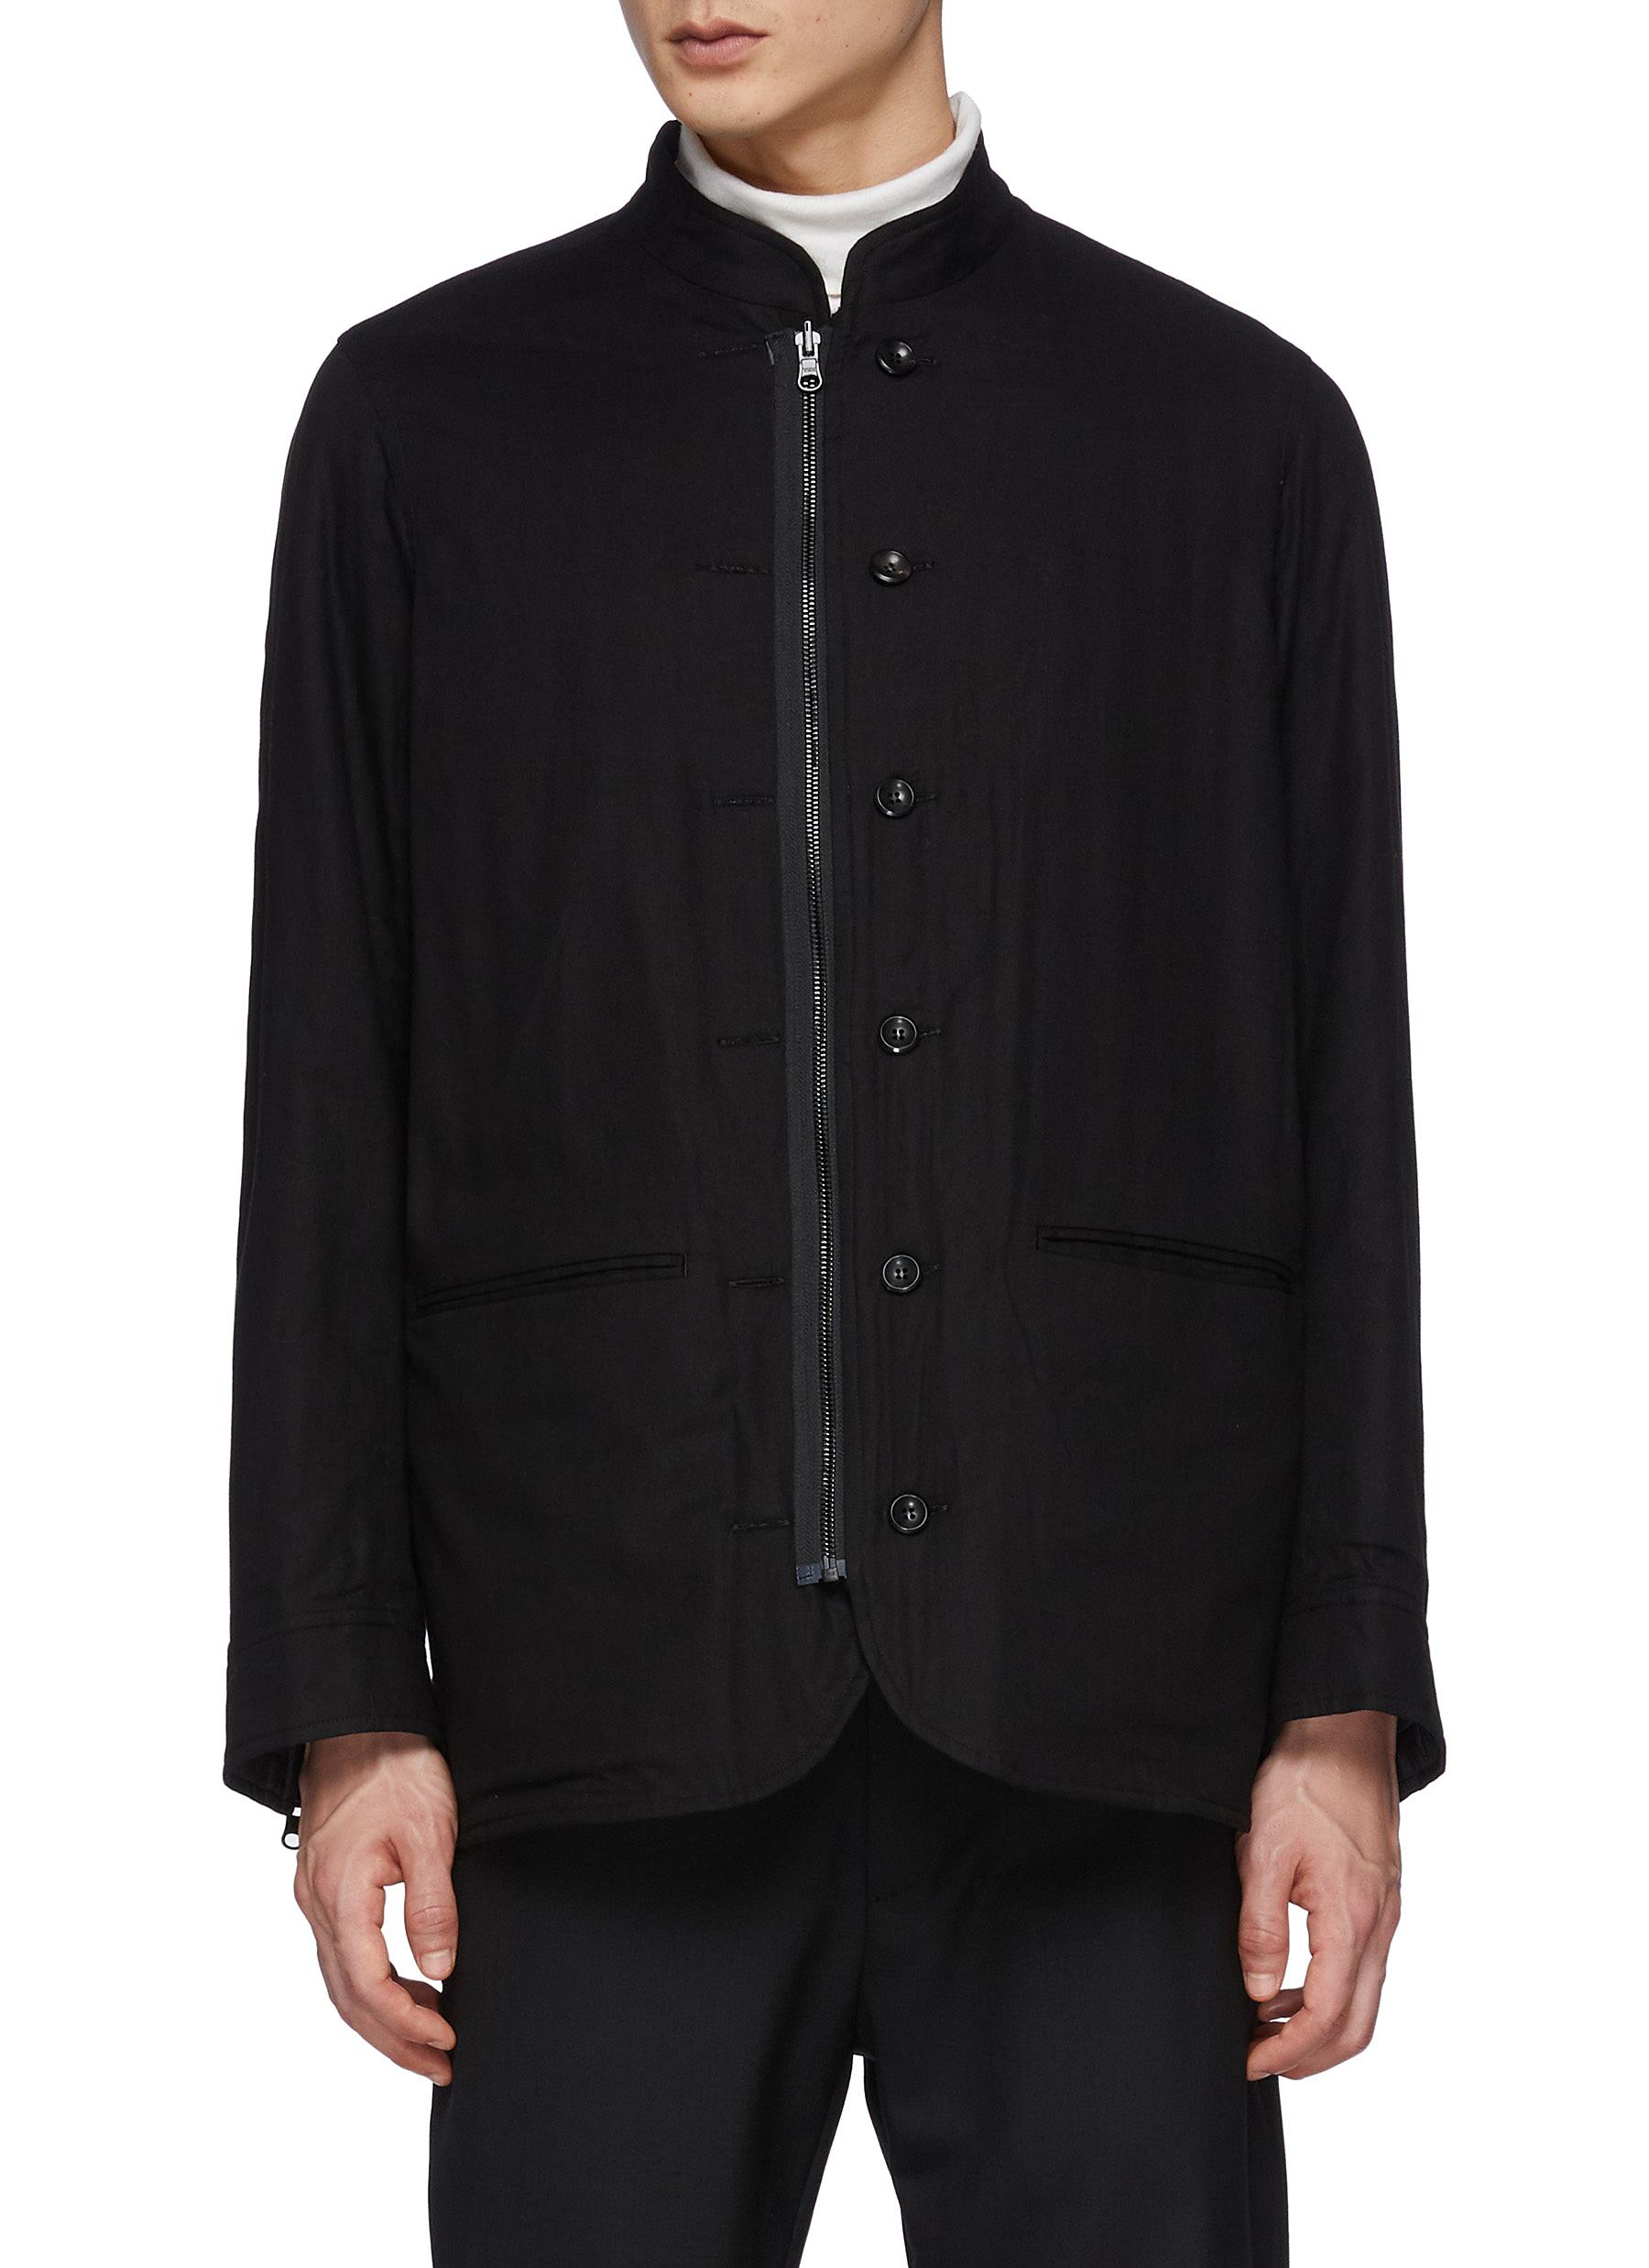 Stand Collar Zip-up/Button Cotton Viyella Reversible Jacket